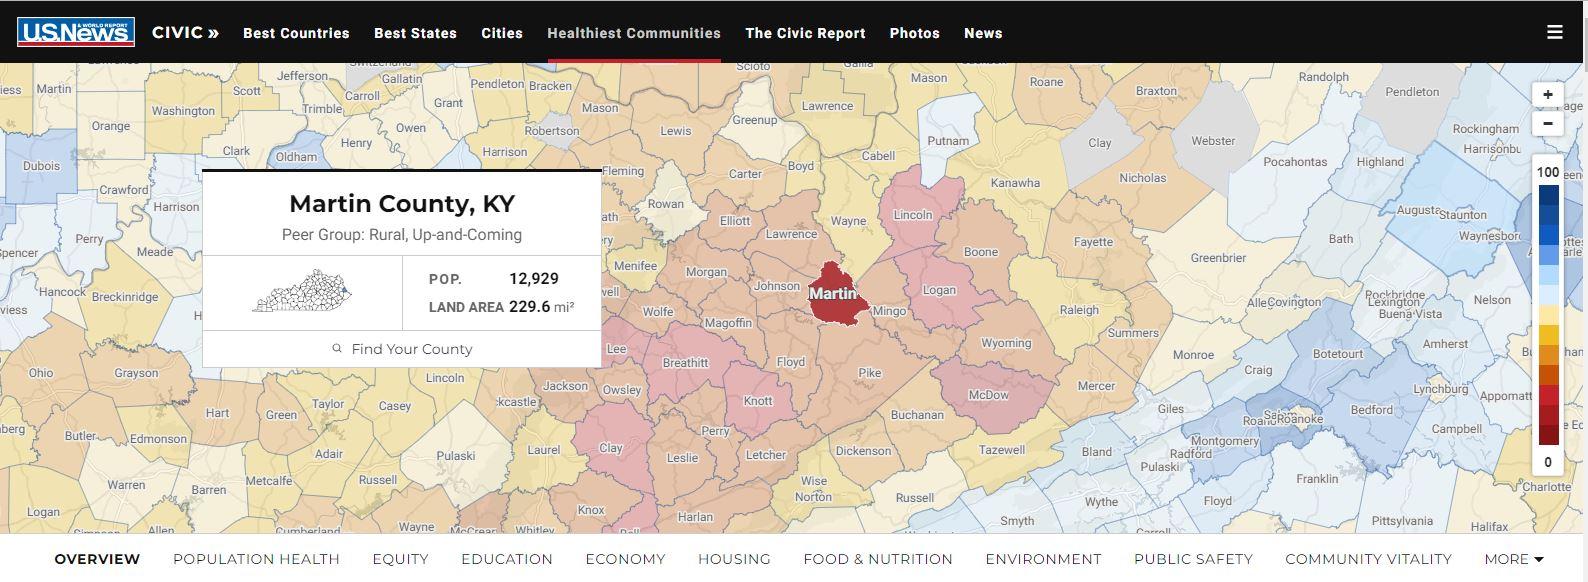 Full County Us Map Trump President - chicagohotdogs.info